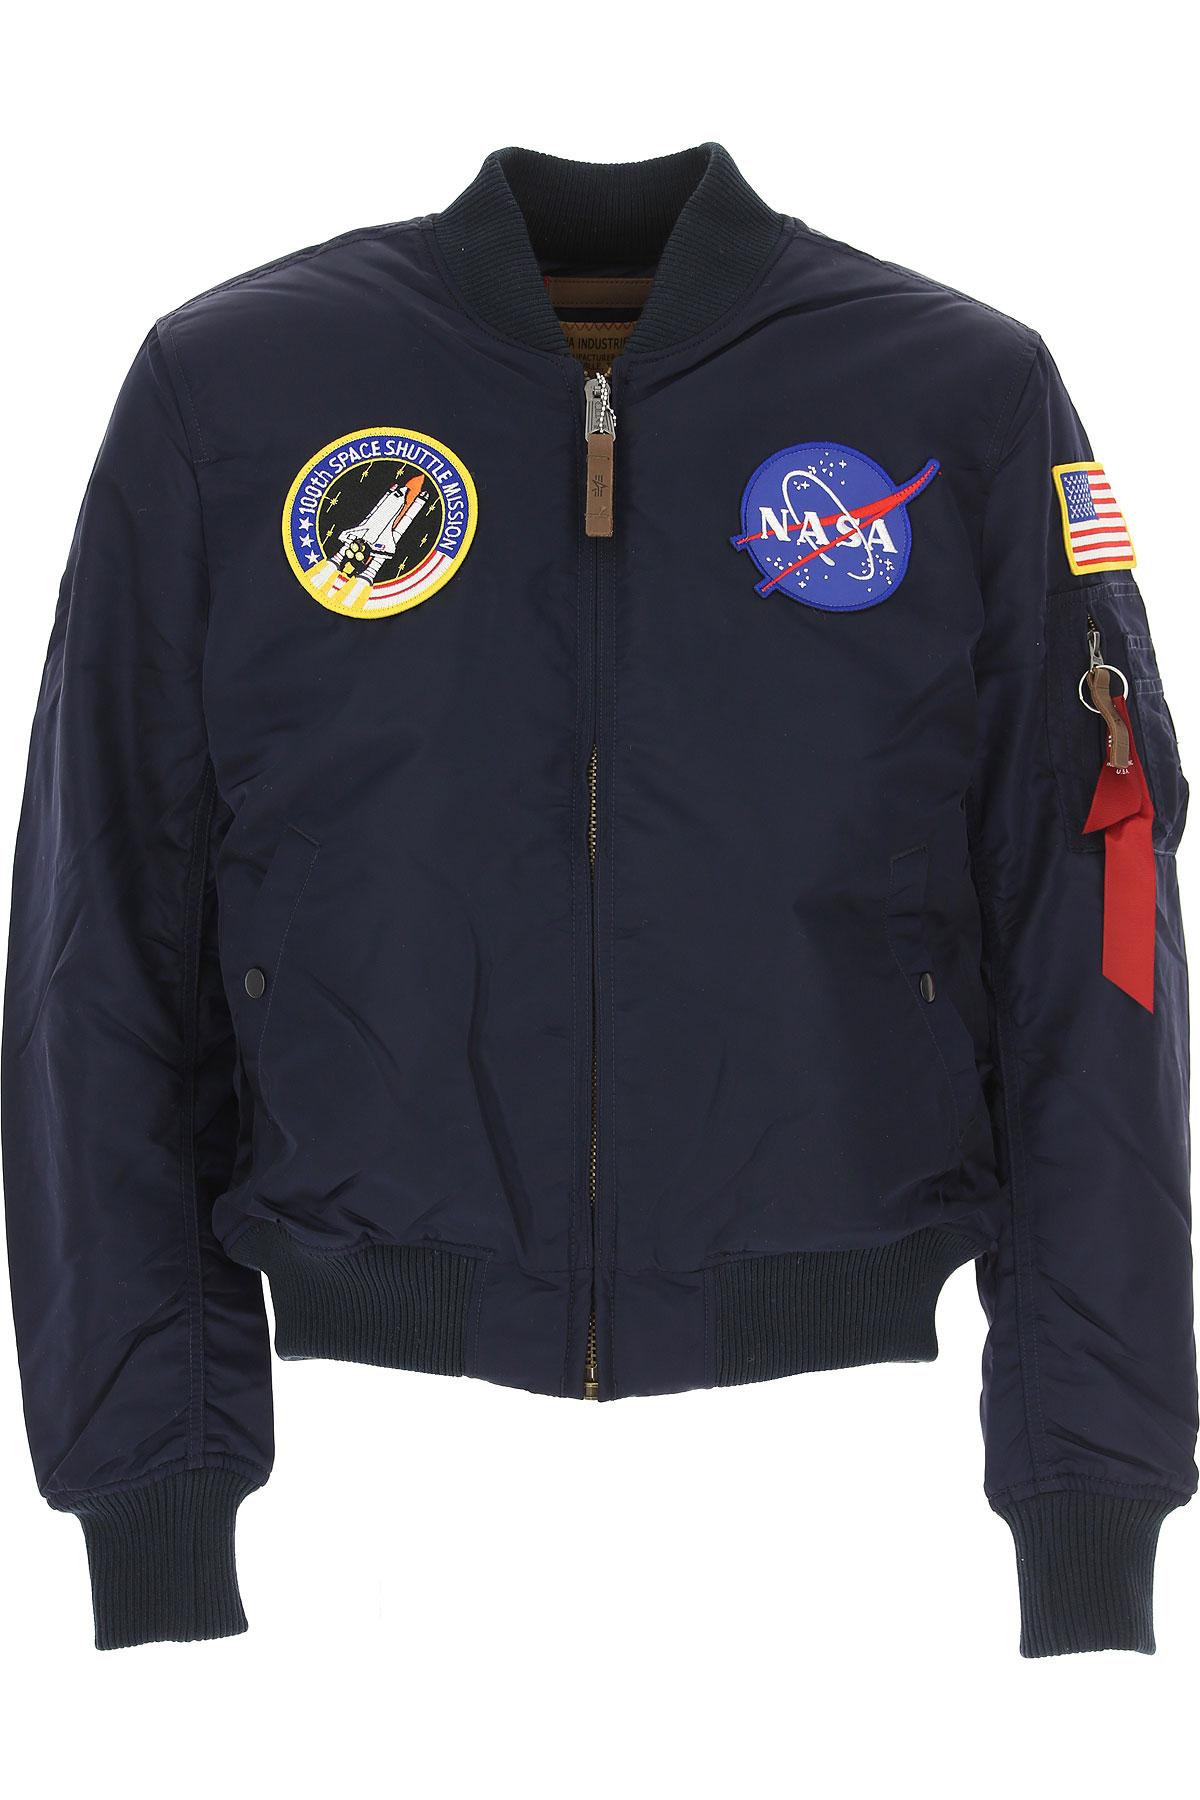 Image of Alpha Industries Jacket for Men, Dark Blue, polyester, 2017, L M S XL